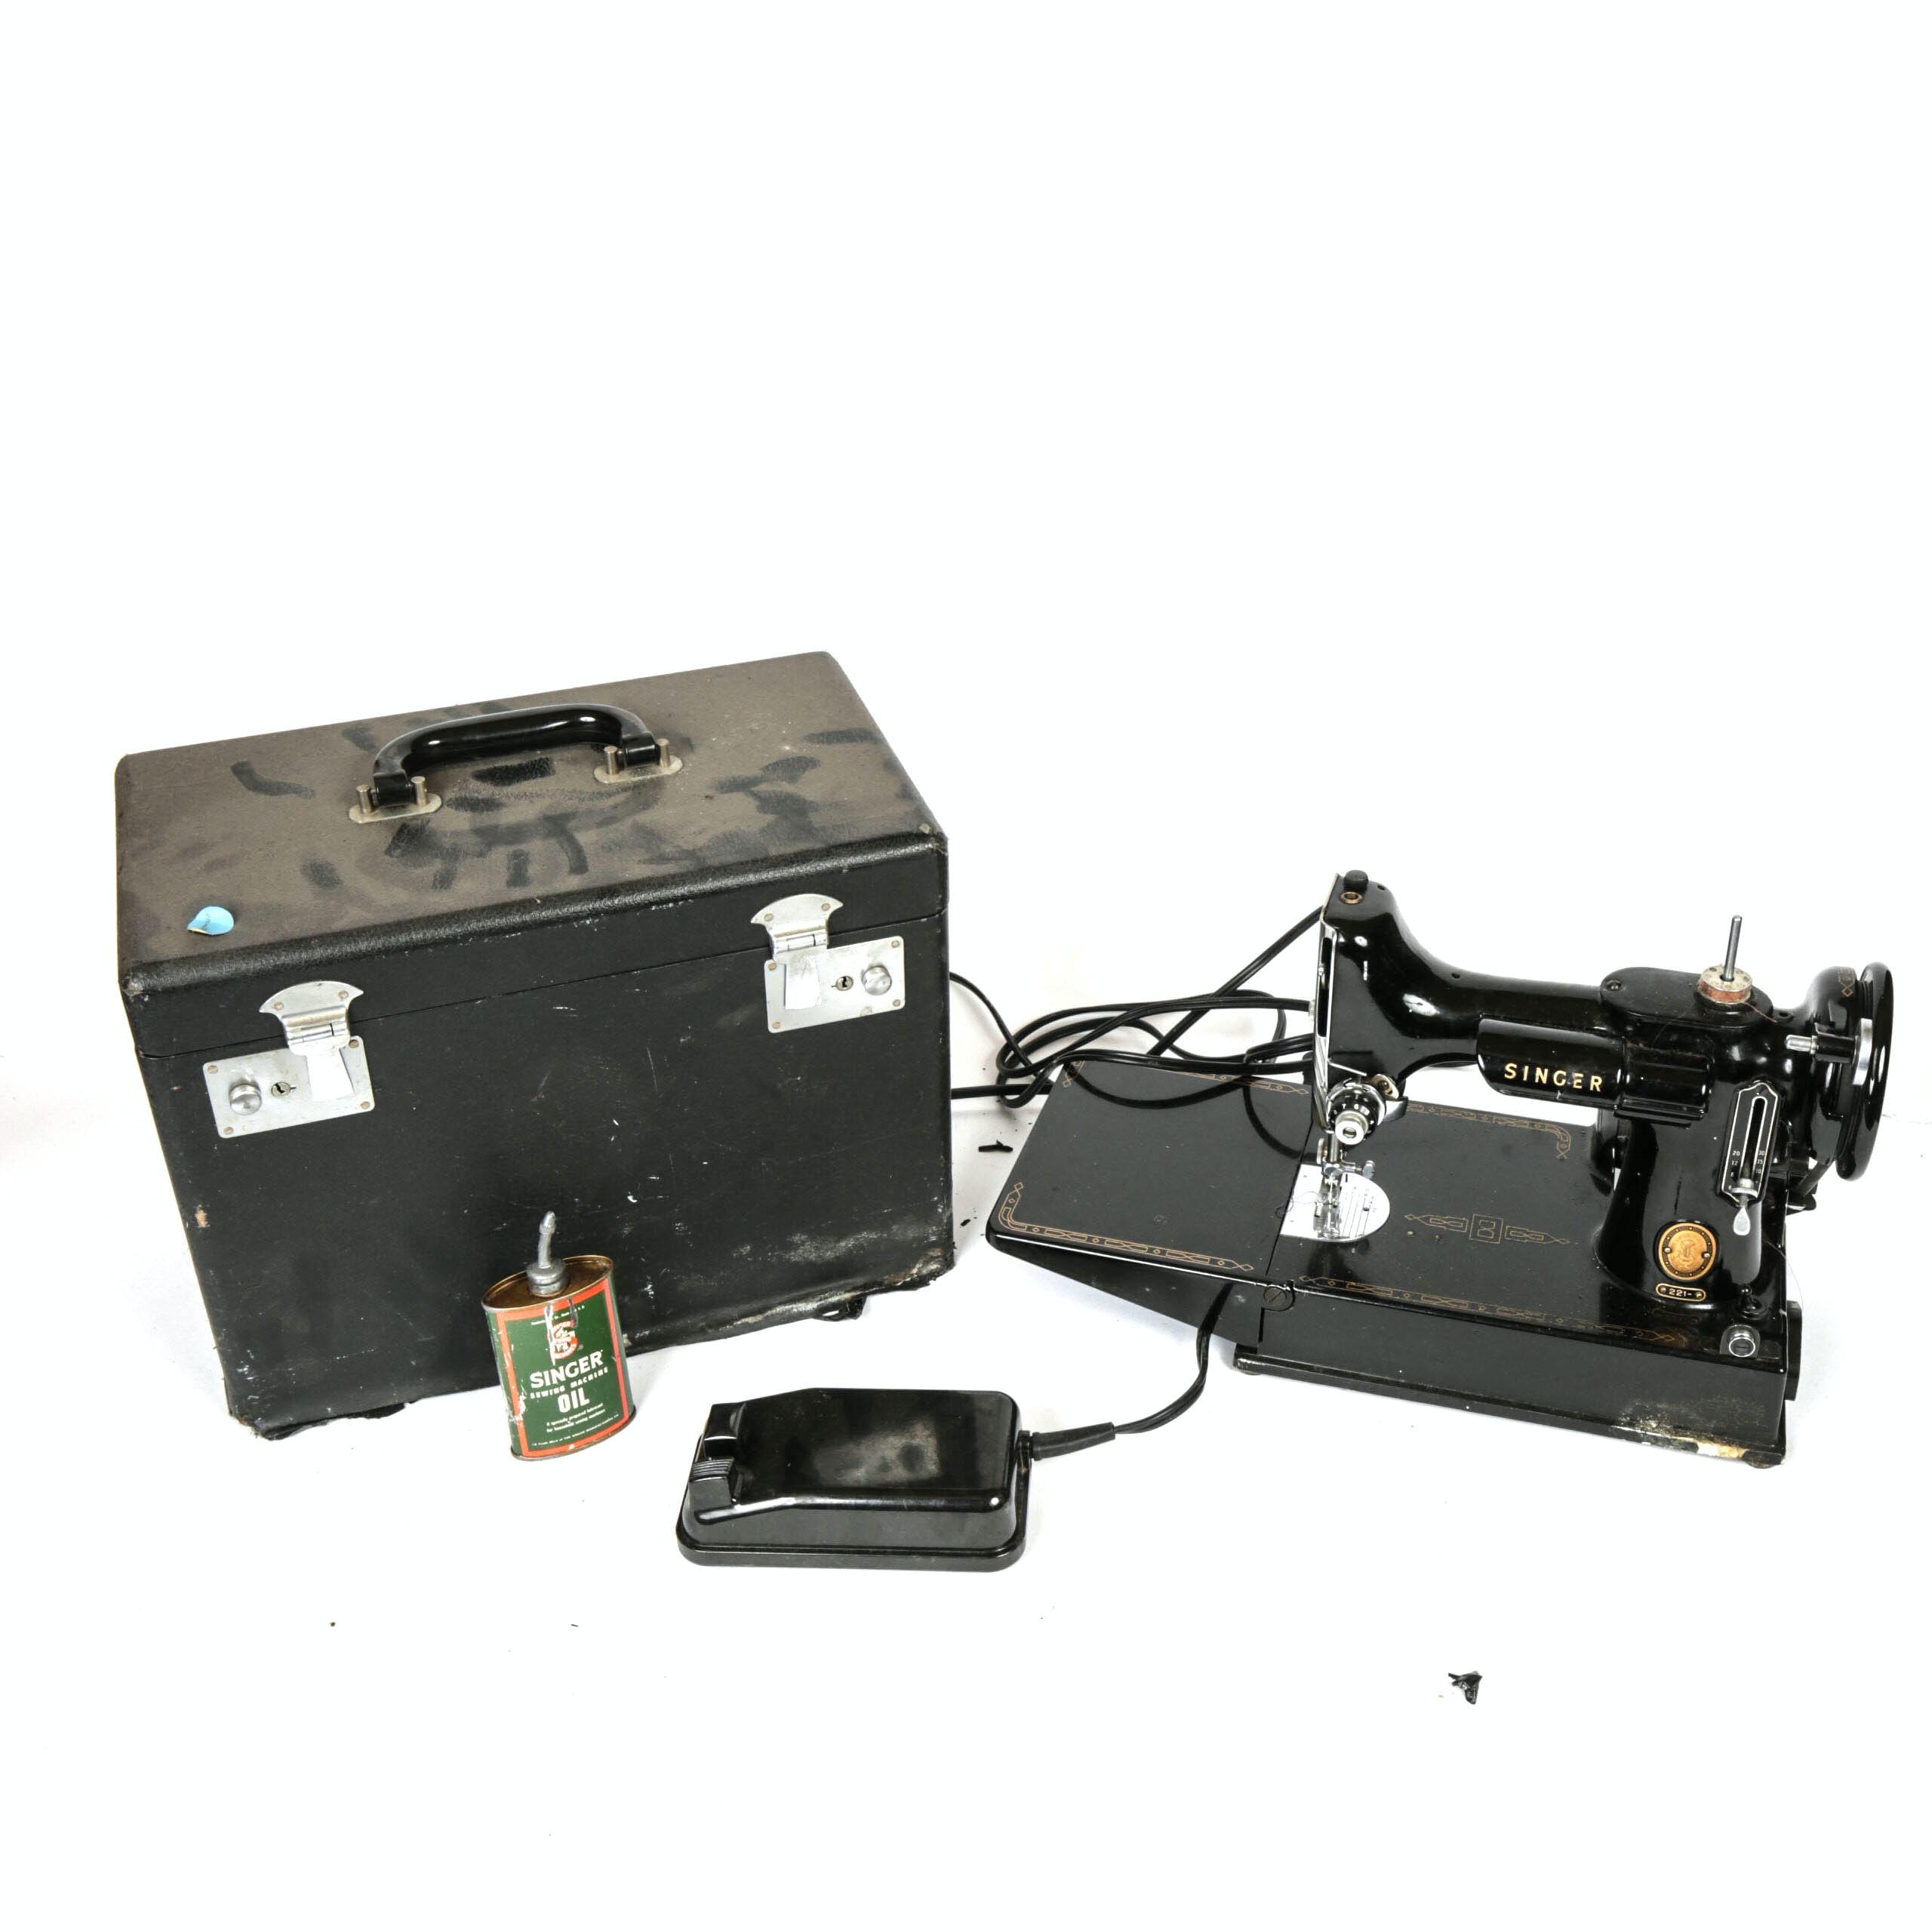 Vintage Singer 221 Featherweight Sewing Machine